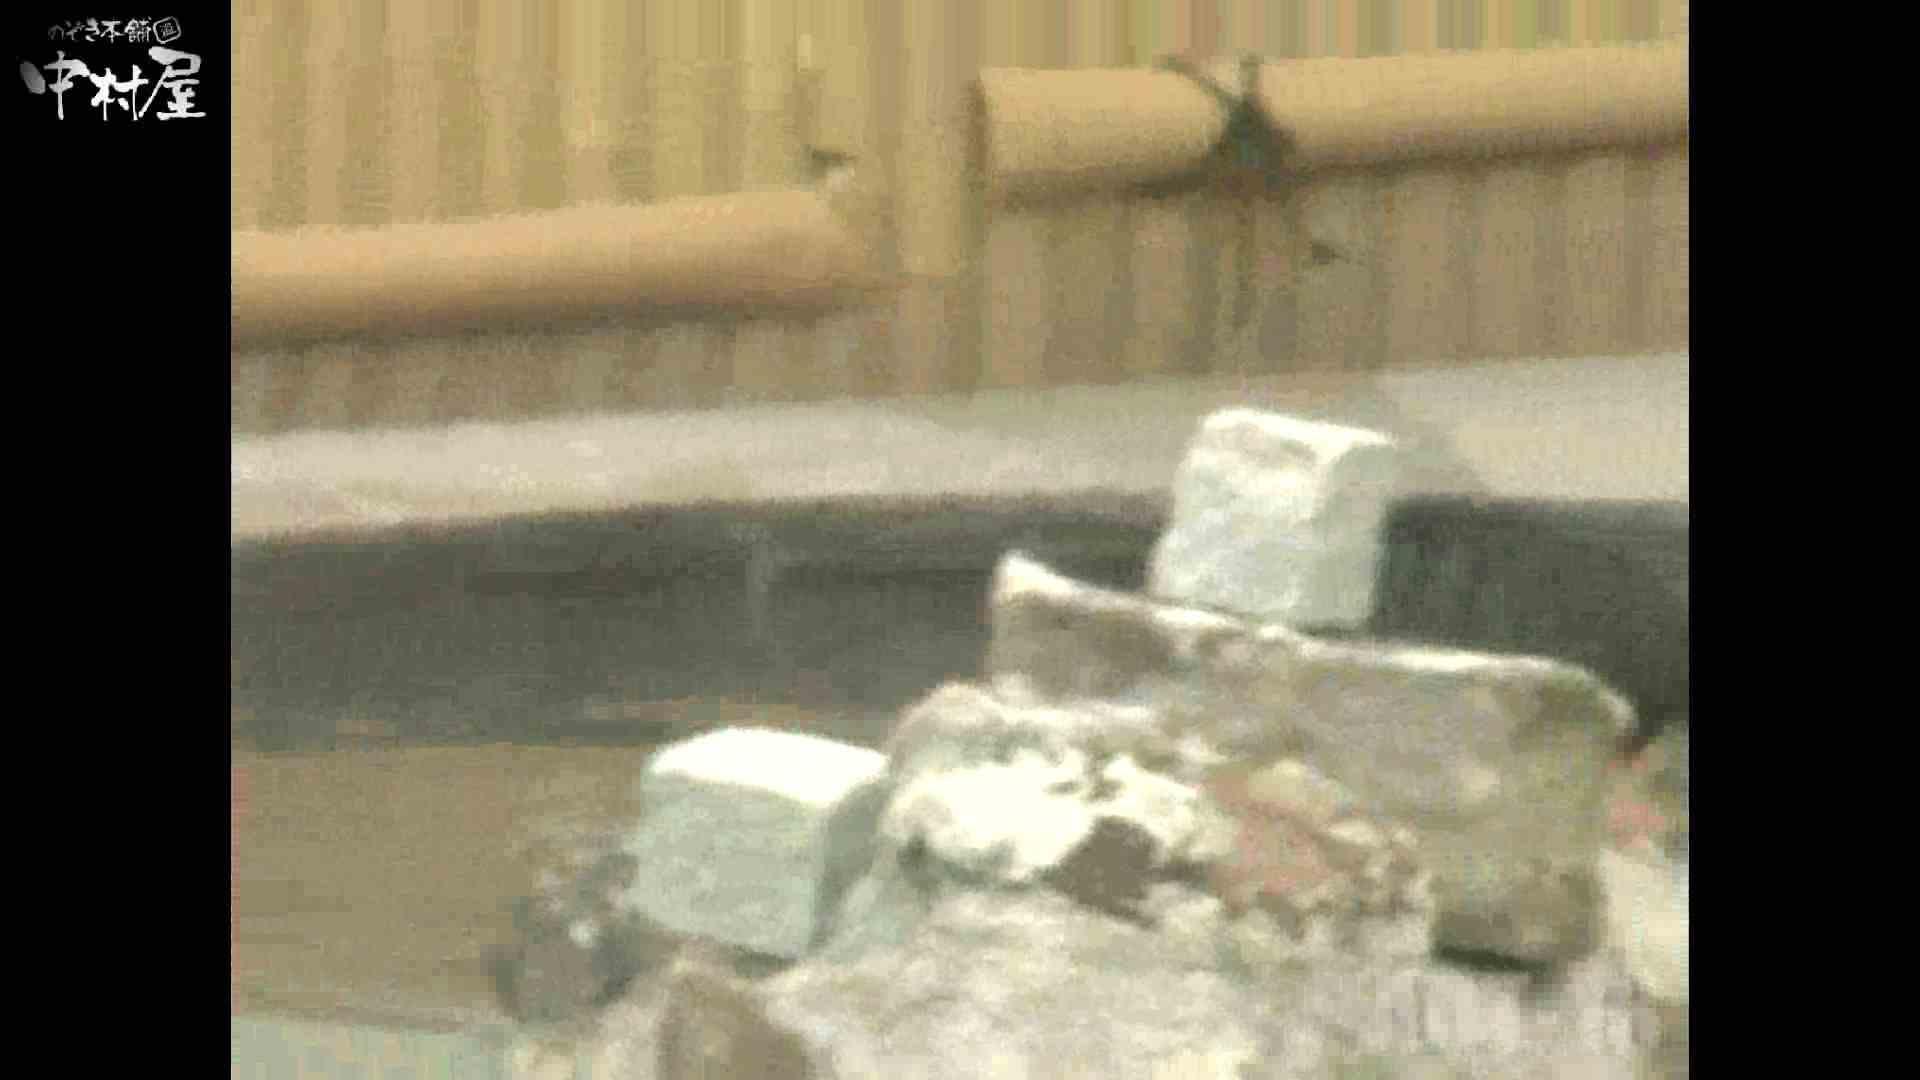 Aquaな露天風呂Vol.882潜入盗撮露天風呂十八判湯 其の七 露天風呂 ワレメ無修正動画無料 113連発 71